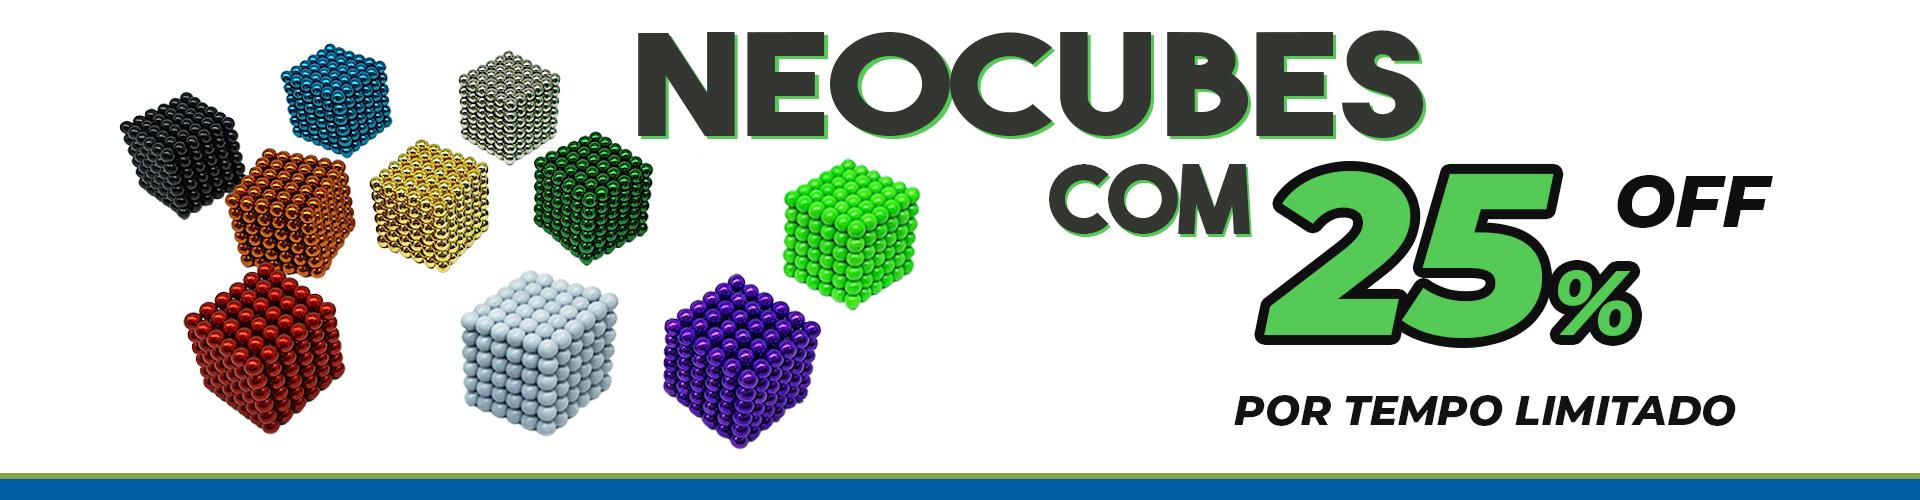 Banner Principal - Promo Neocube Julho/21